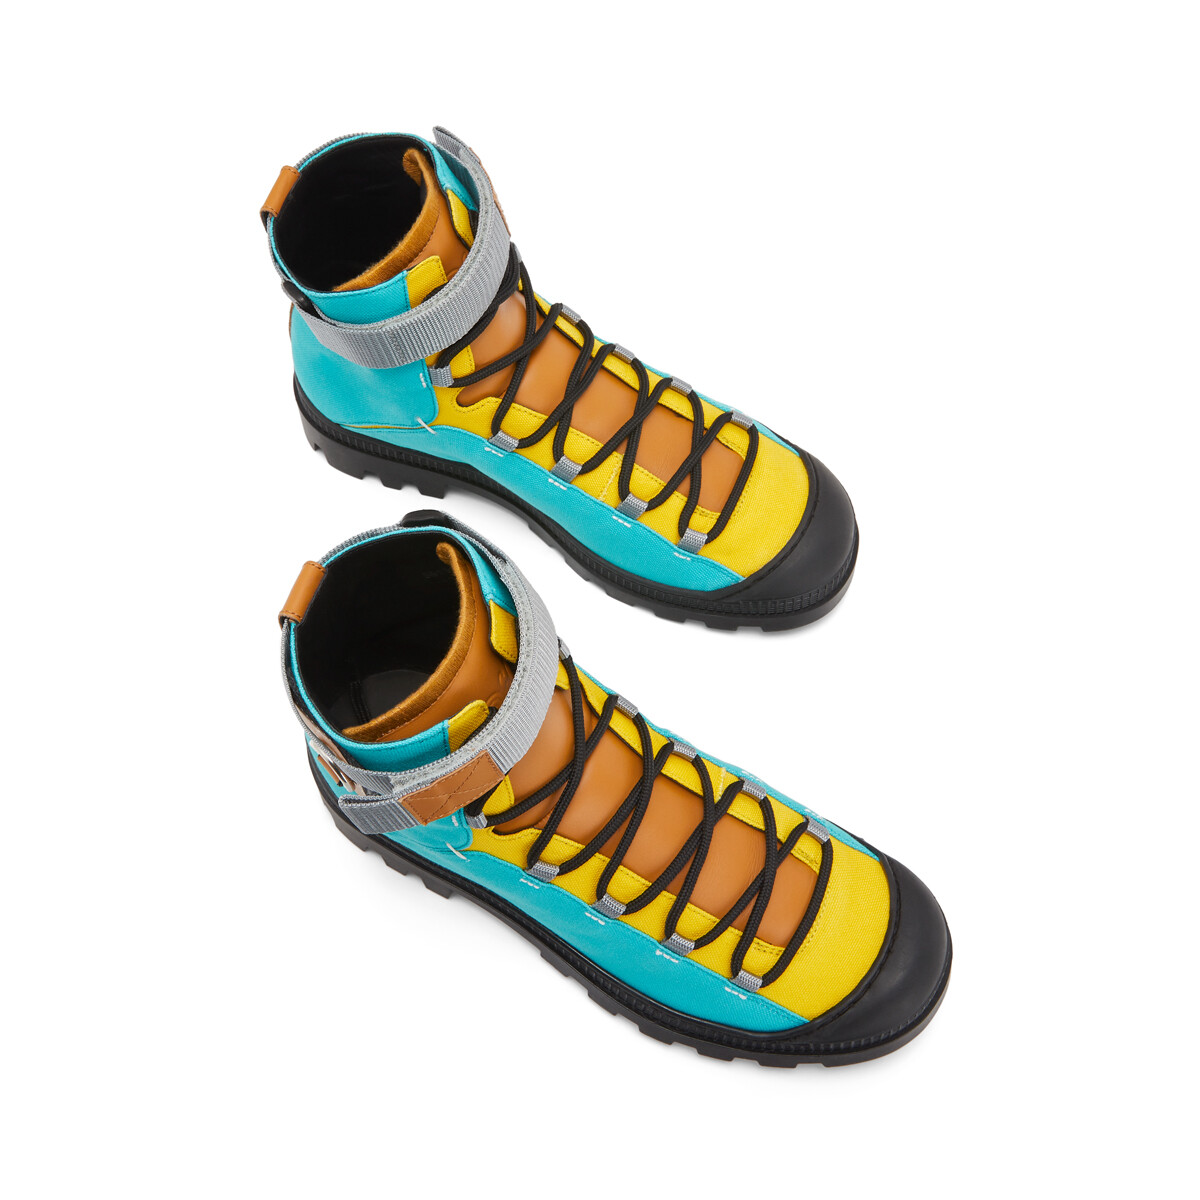 LOEWE ハイキング ブーツ Eye/LOEWE/Nature turquoise/tan front